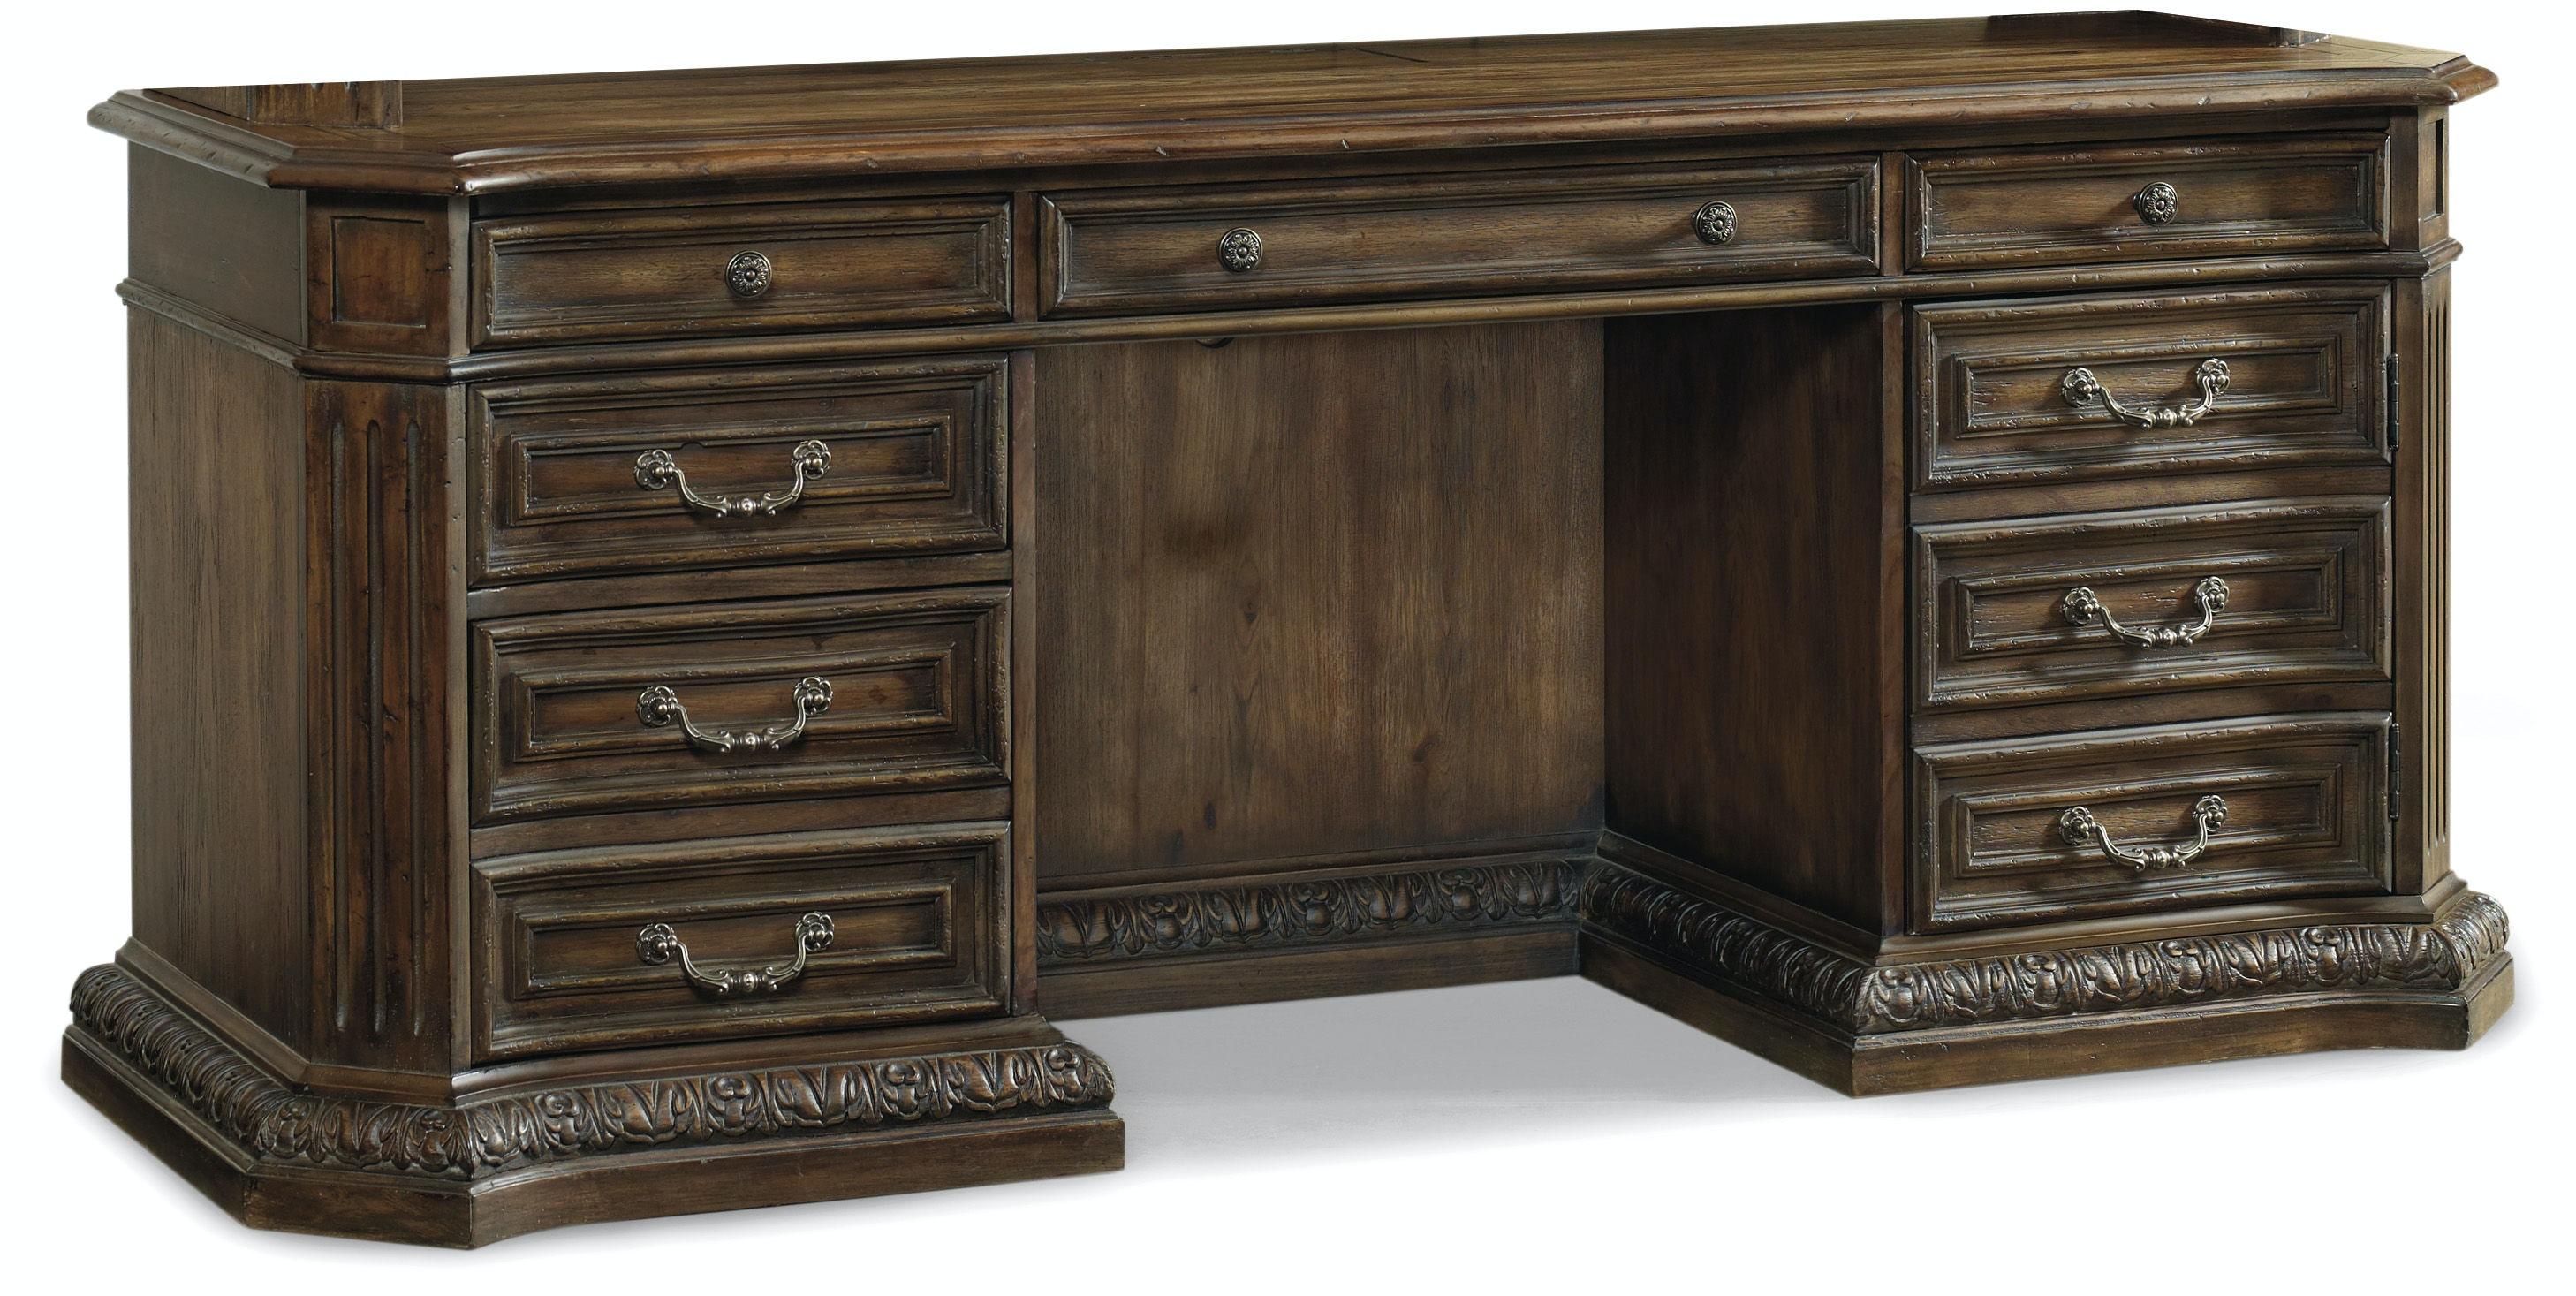 Hooker Furniture Rhapsody Computer Credenza 5070 10464